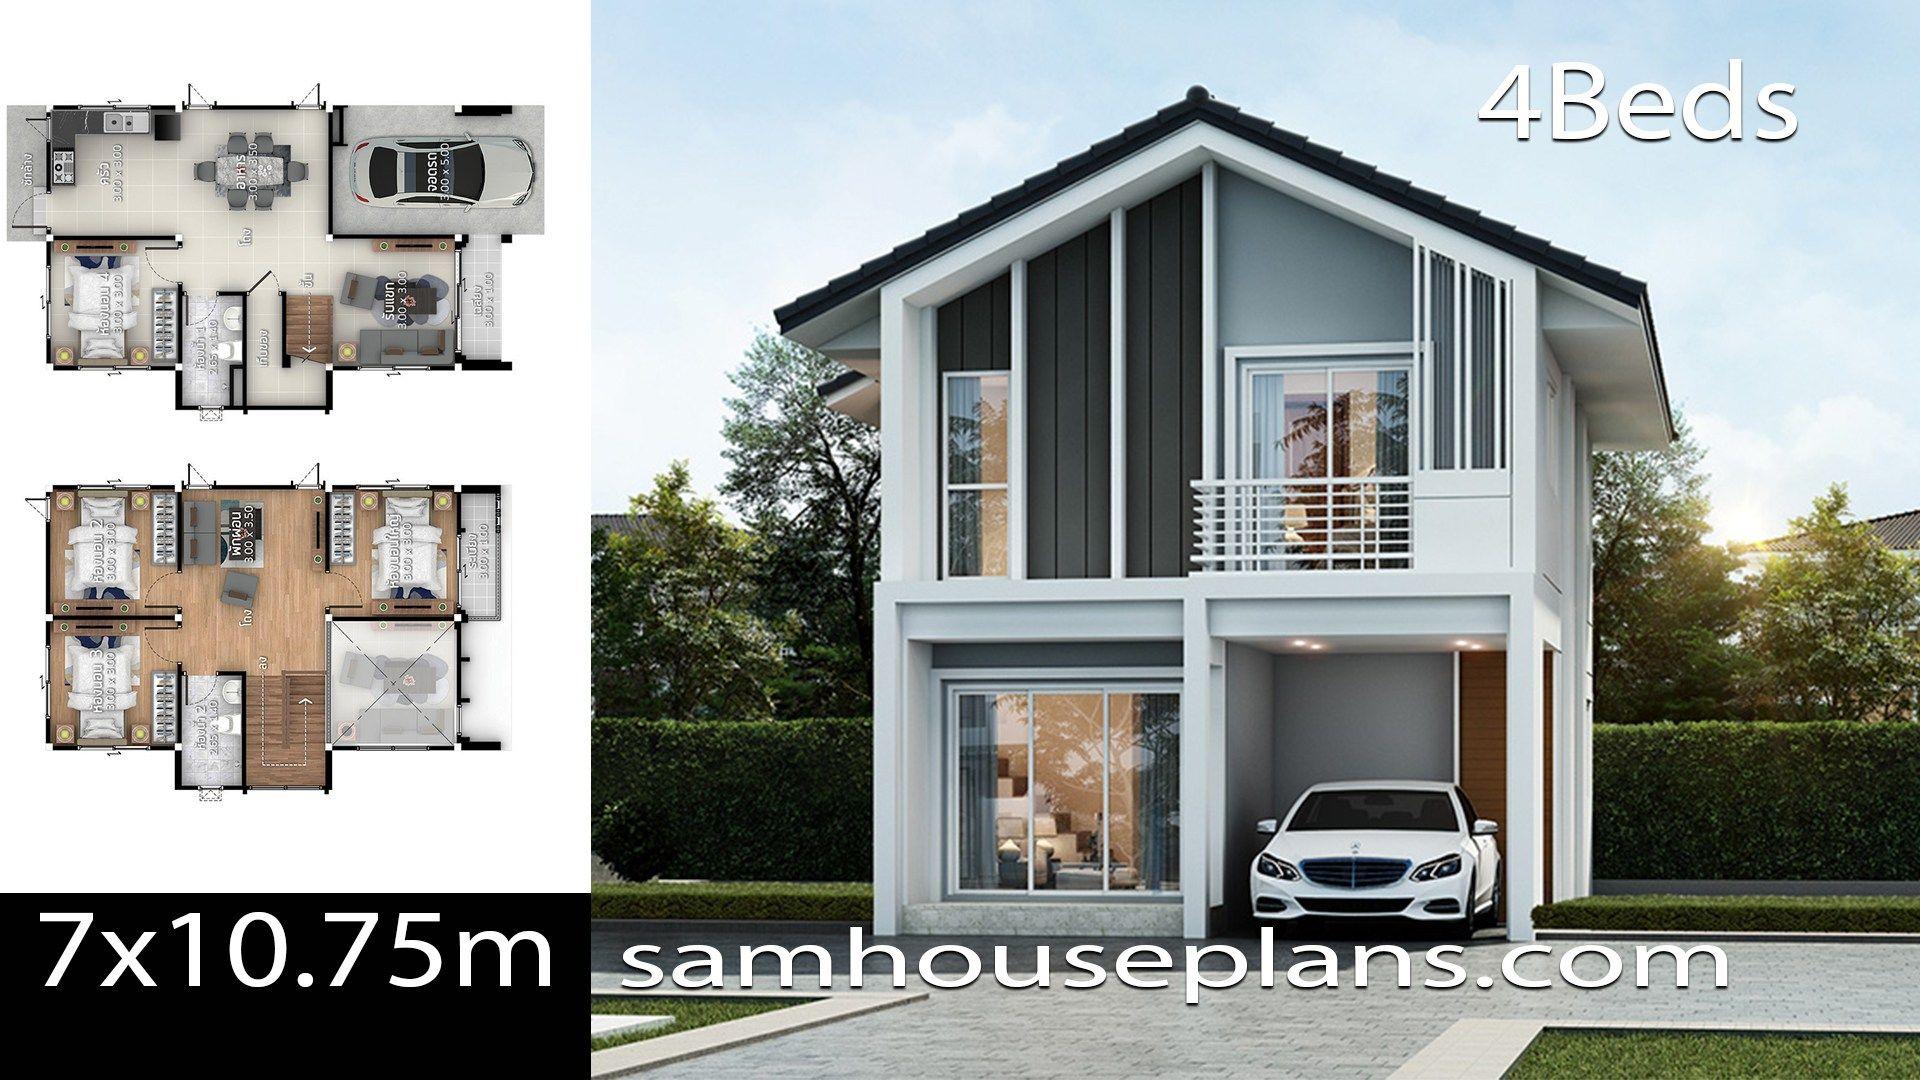 Https I2 Wp Com Samhouseplans Com Wp Content Uploads 2019 09 House Plans Idea 7x10 75 With 4 Bedrooms Jpg W 1 Di 2020 Desain Eksterior Denah Rumah Denah Desain Rumah